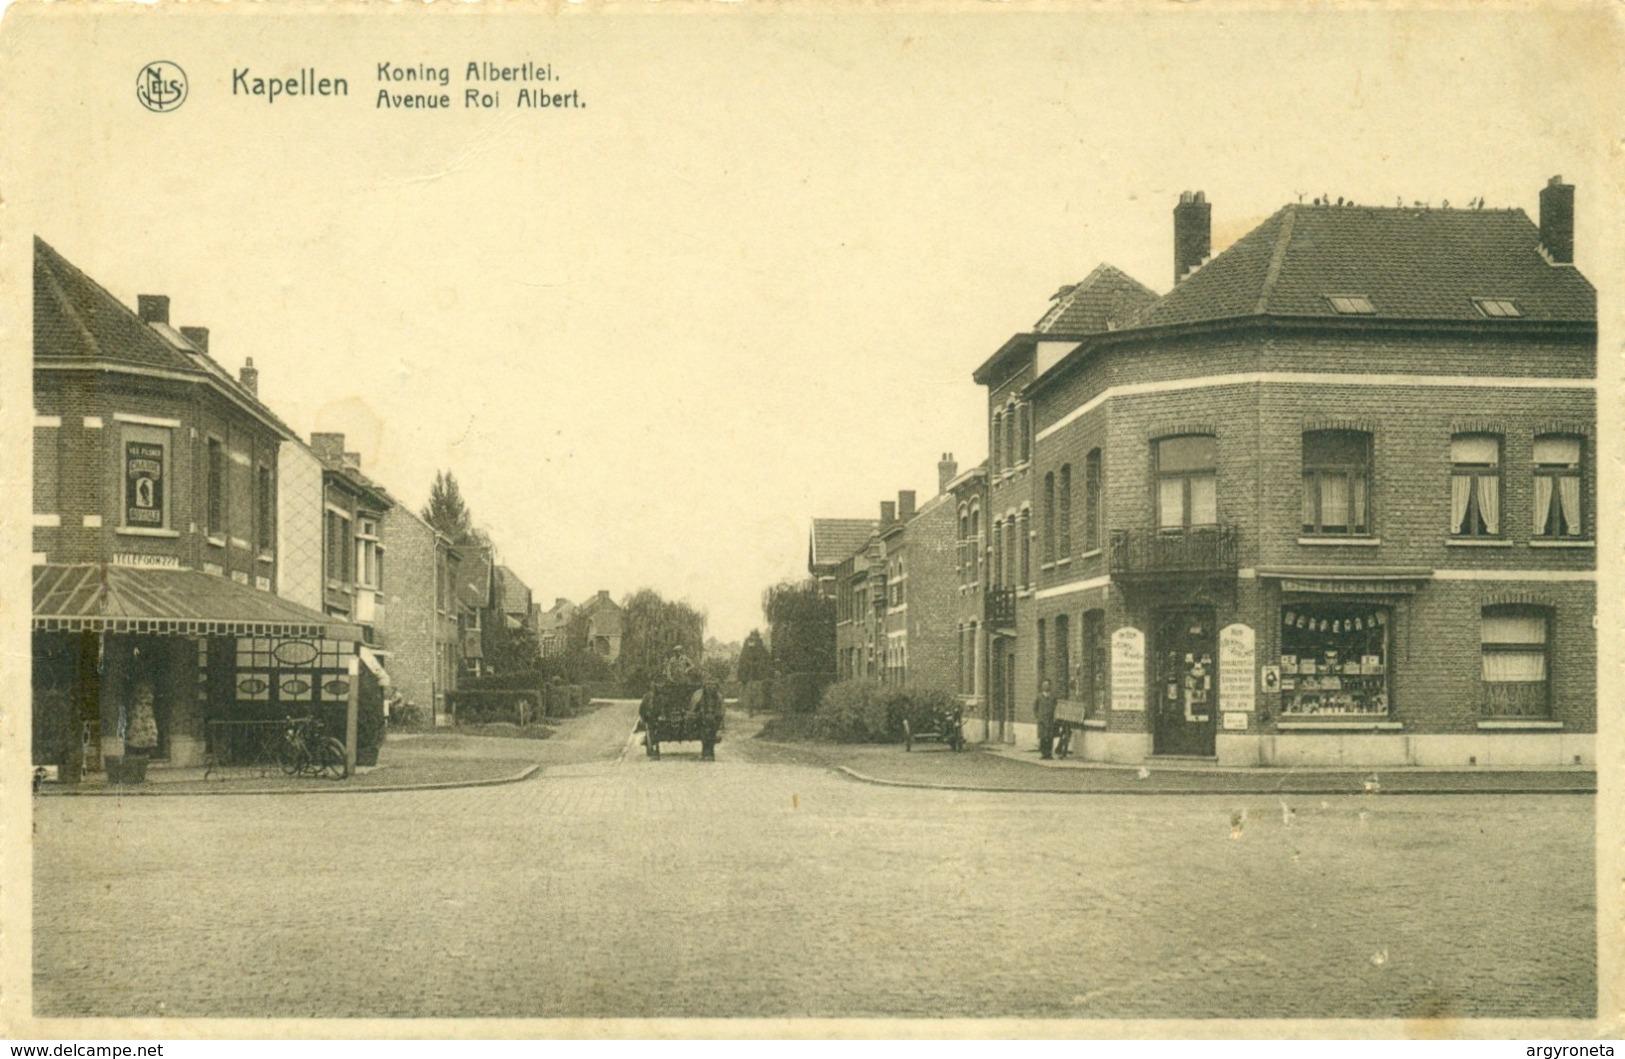 Kapellen - Koning Albertlei - Winkel - Café - Kapellen